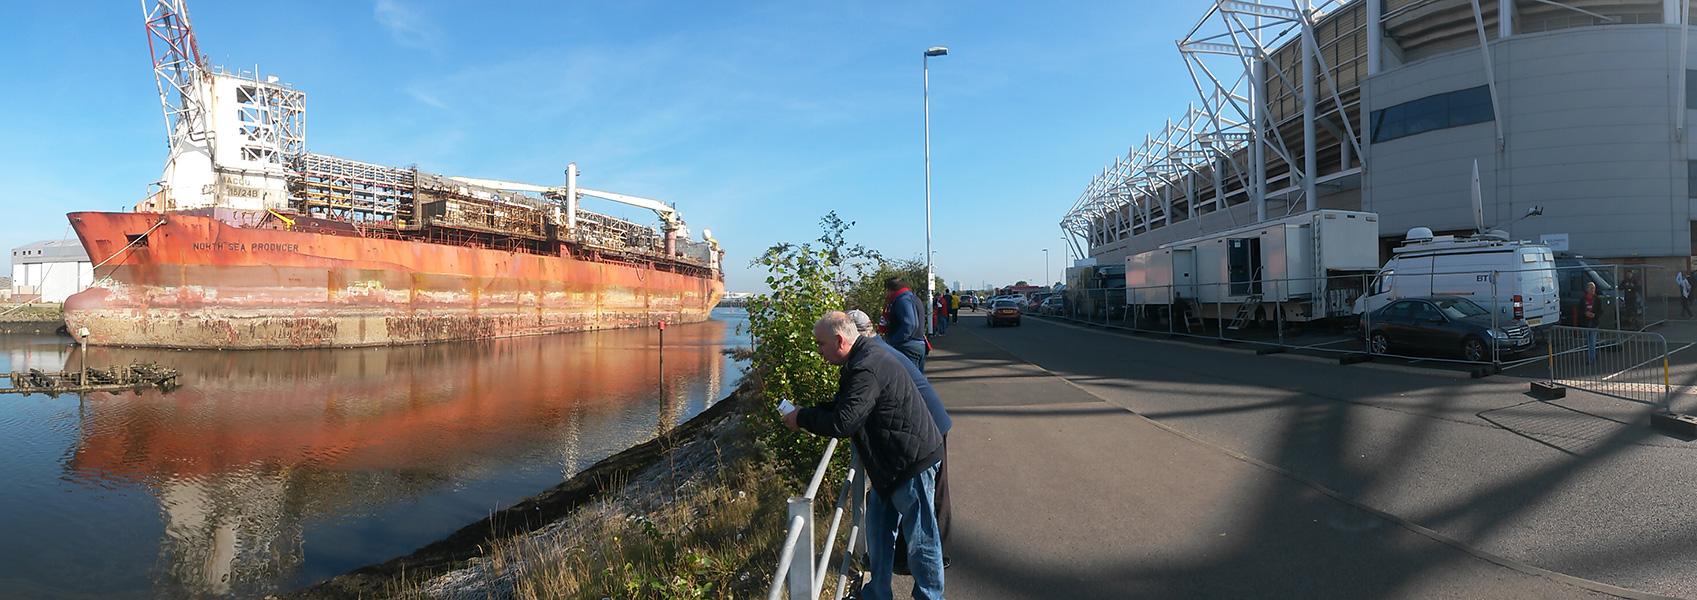 north sea producer ship on the river tees alongside the riverside stadium